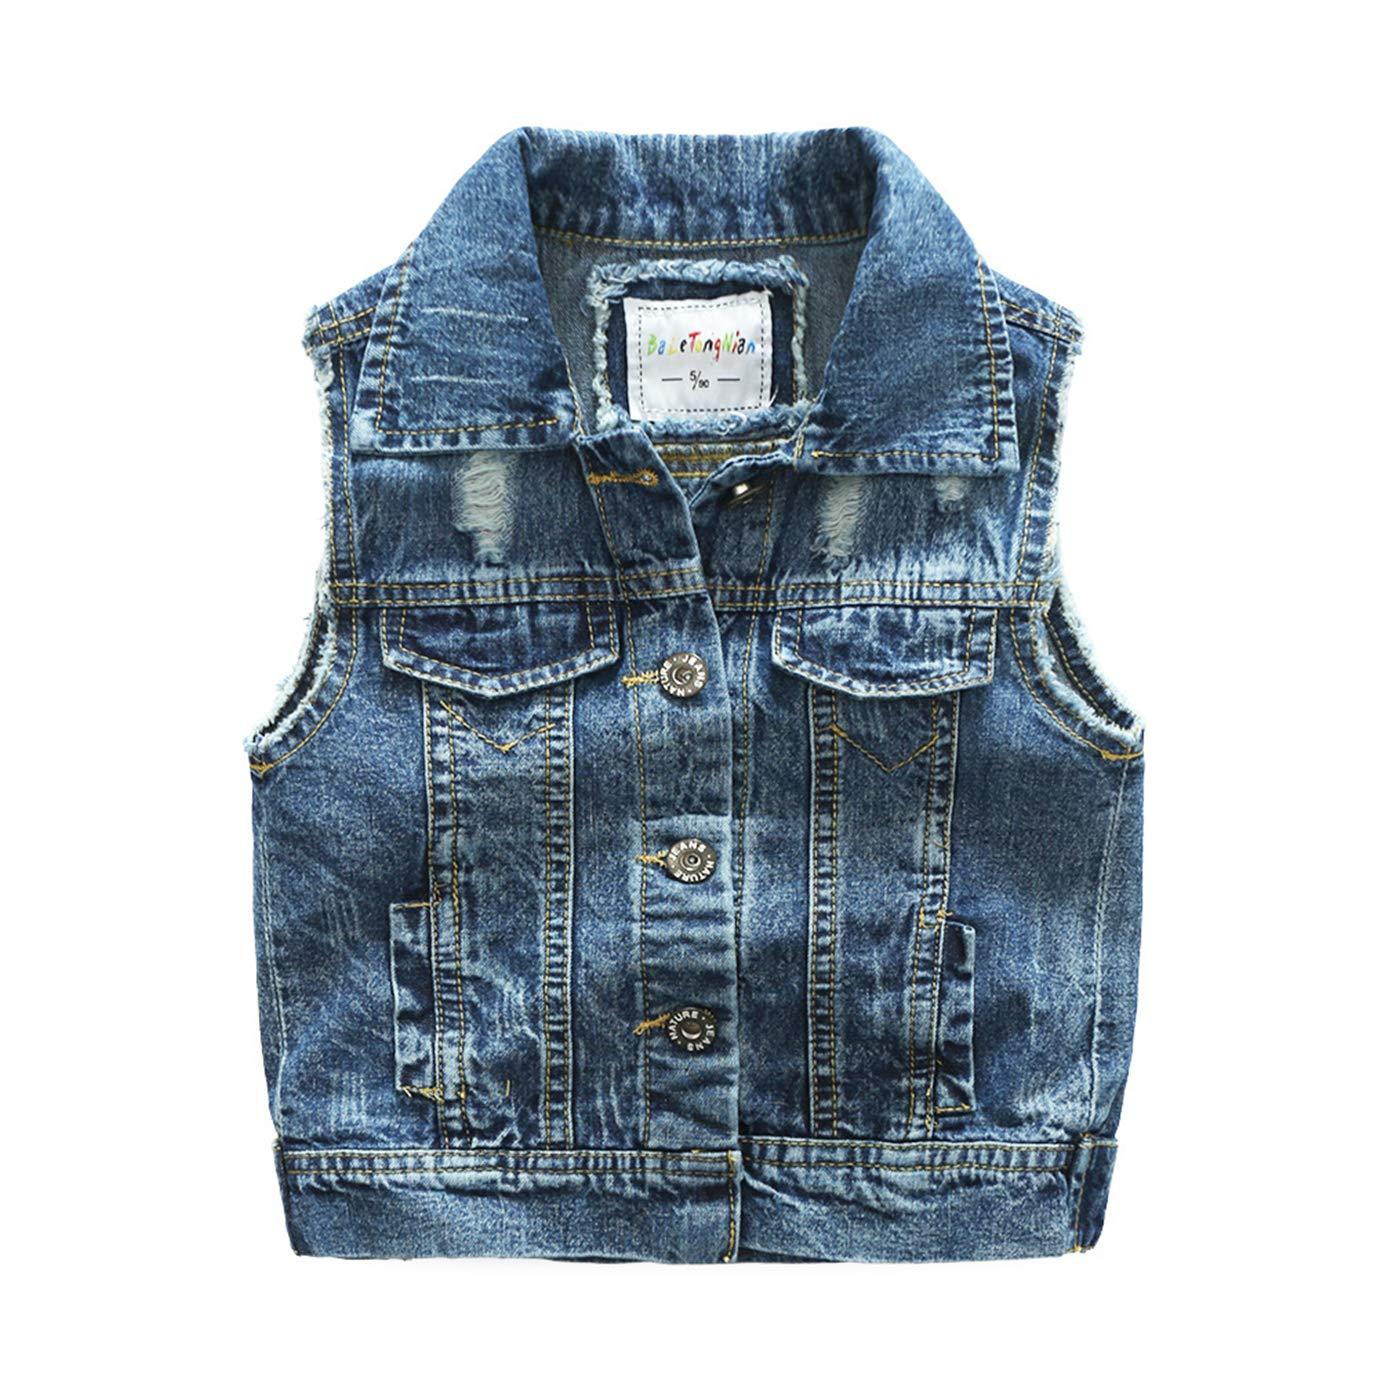 Baletongnian Denim Vest Kids Cotton Fall Sleeveless Denim Jacket Outwear 2-6 Years